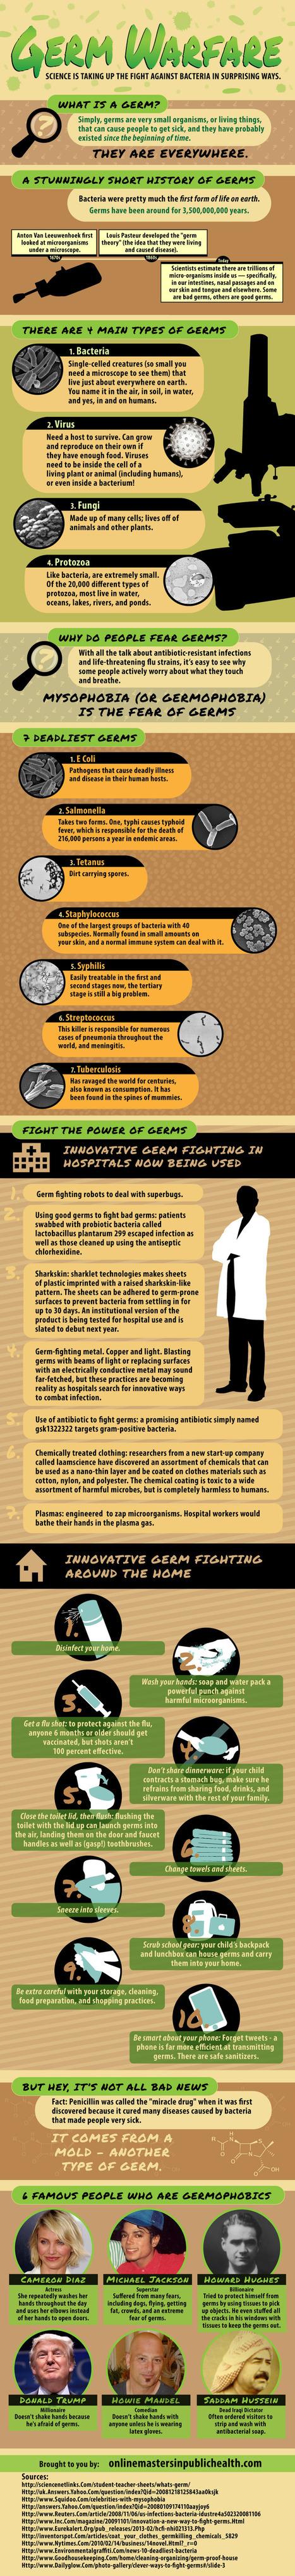 Germ Warfare [INFOGRAPHIC] #germ #warfare | Interesting Reading | Scoop.it